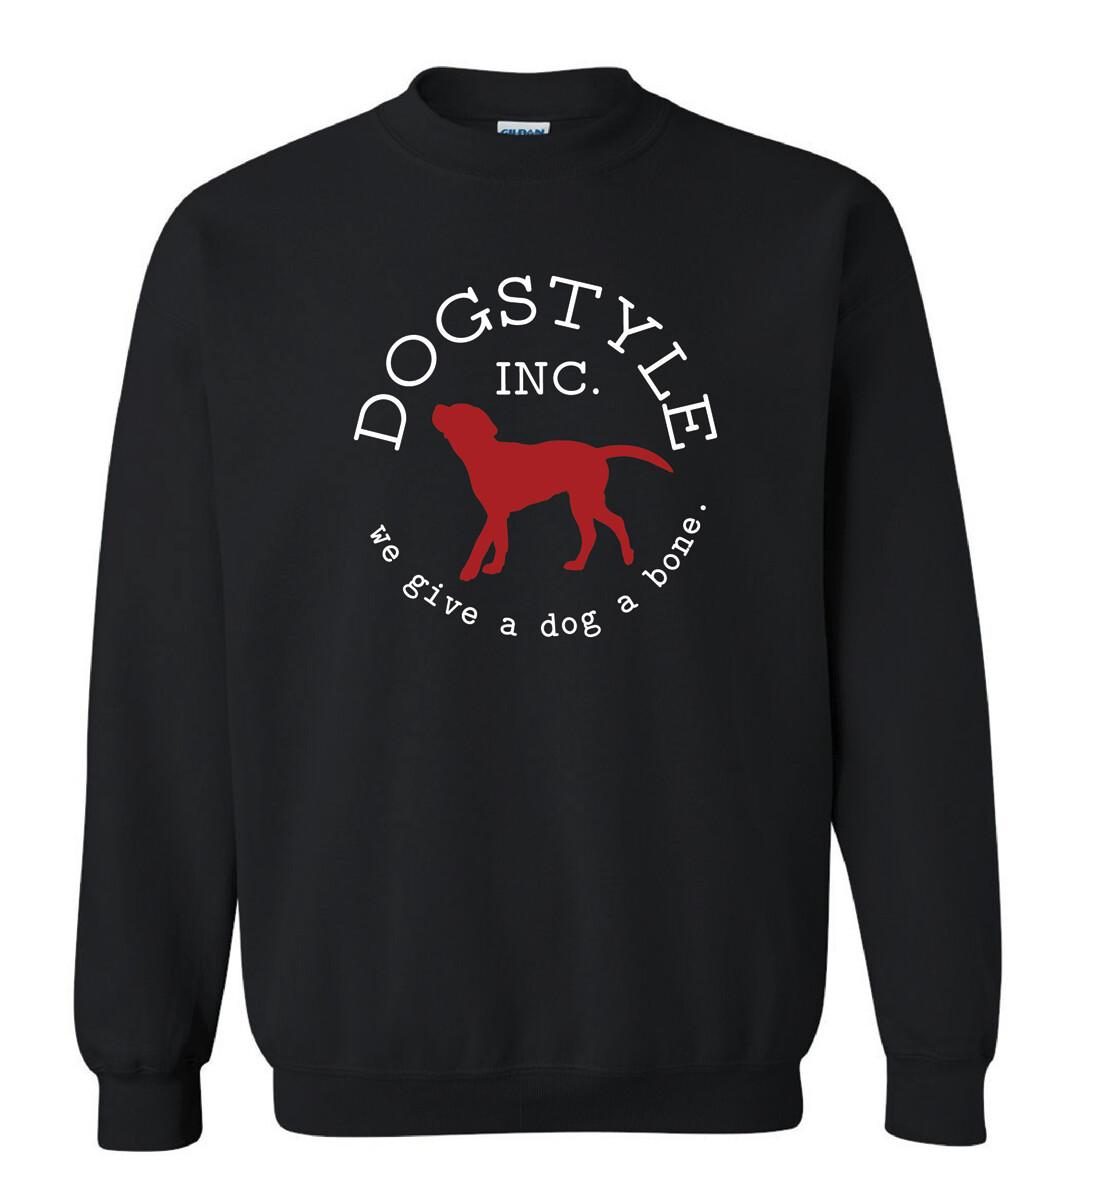 Dogstyle Crew Neck Sweatshirt - Black